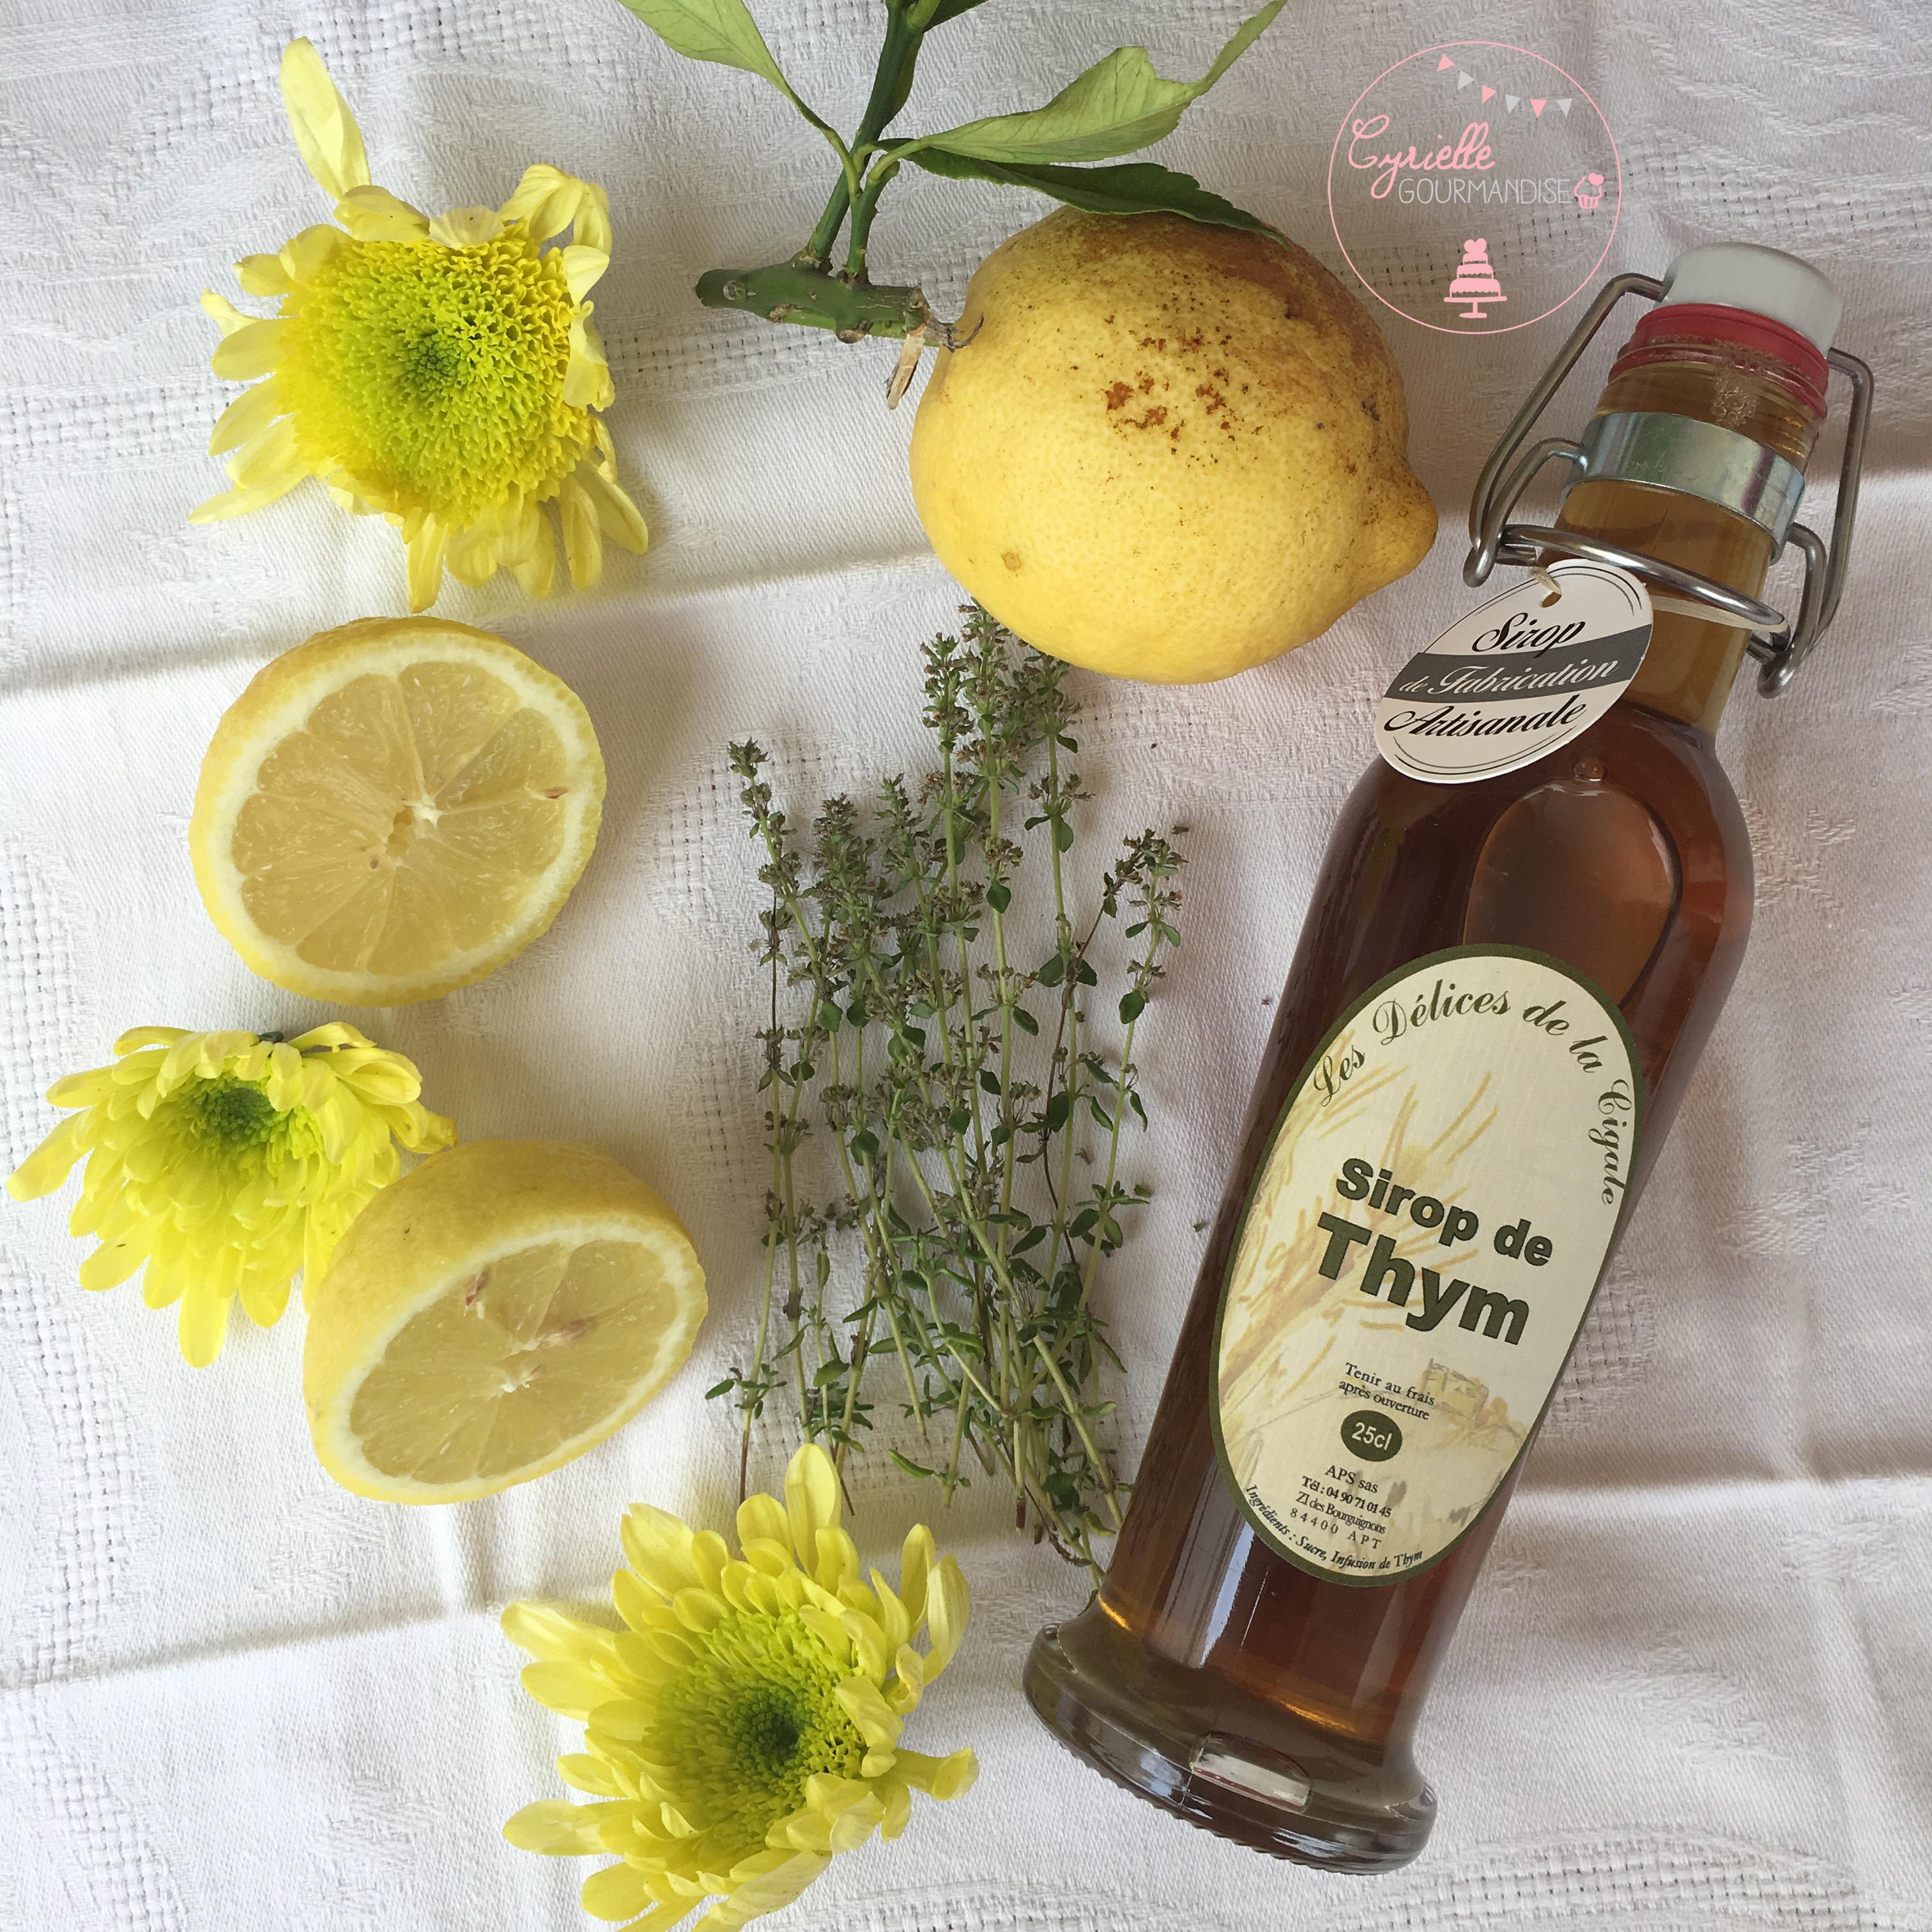 Citronnade Thym Ingrédients